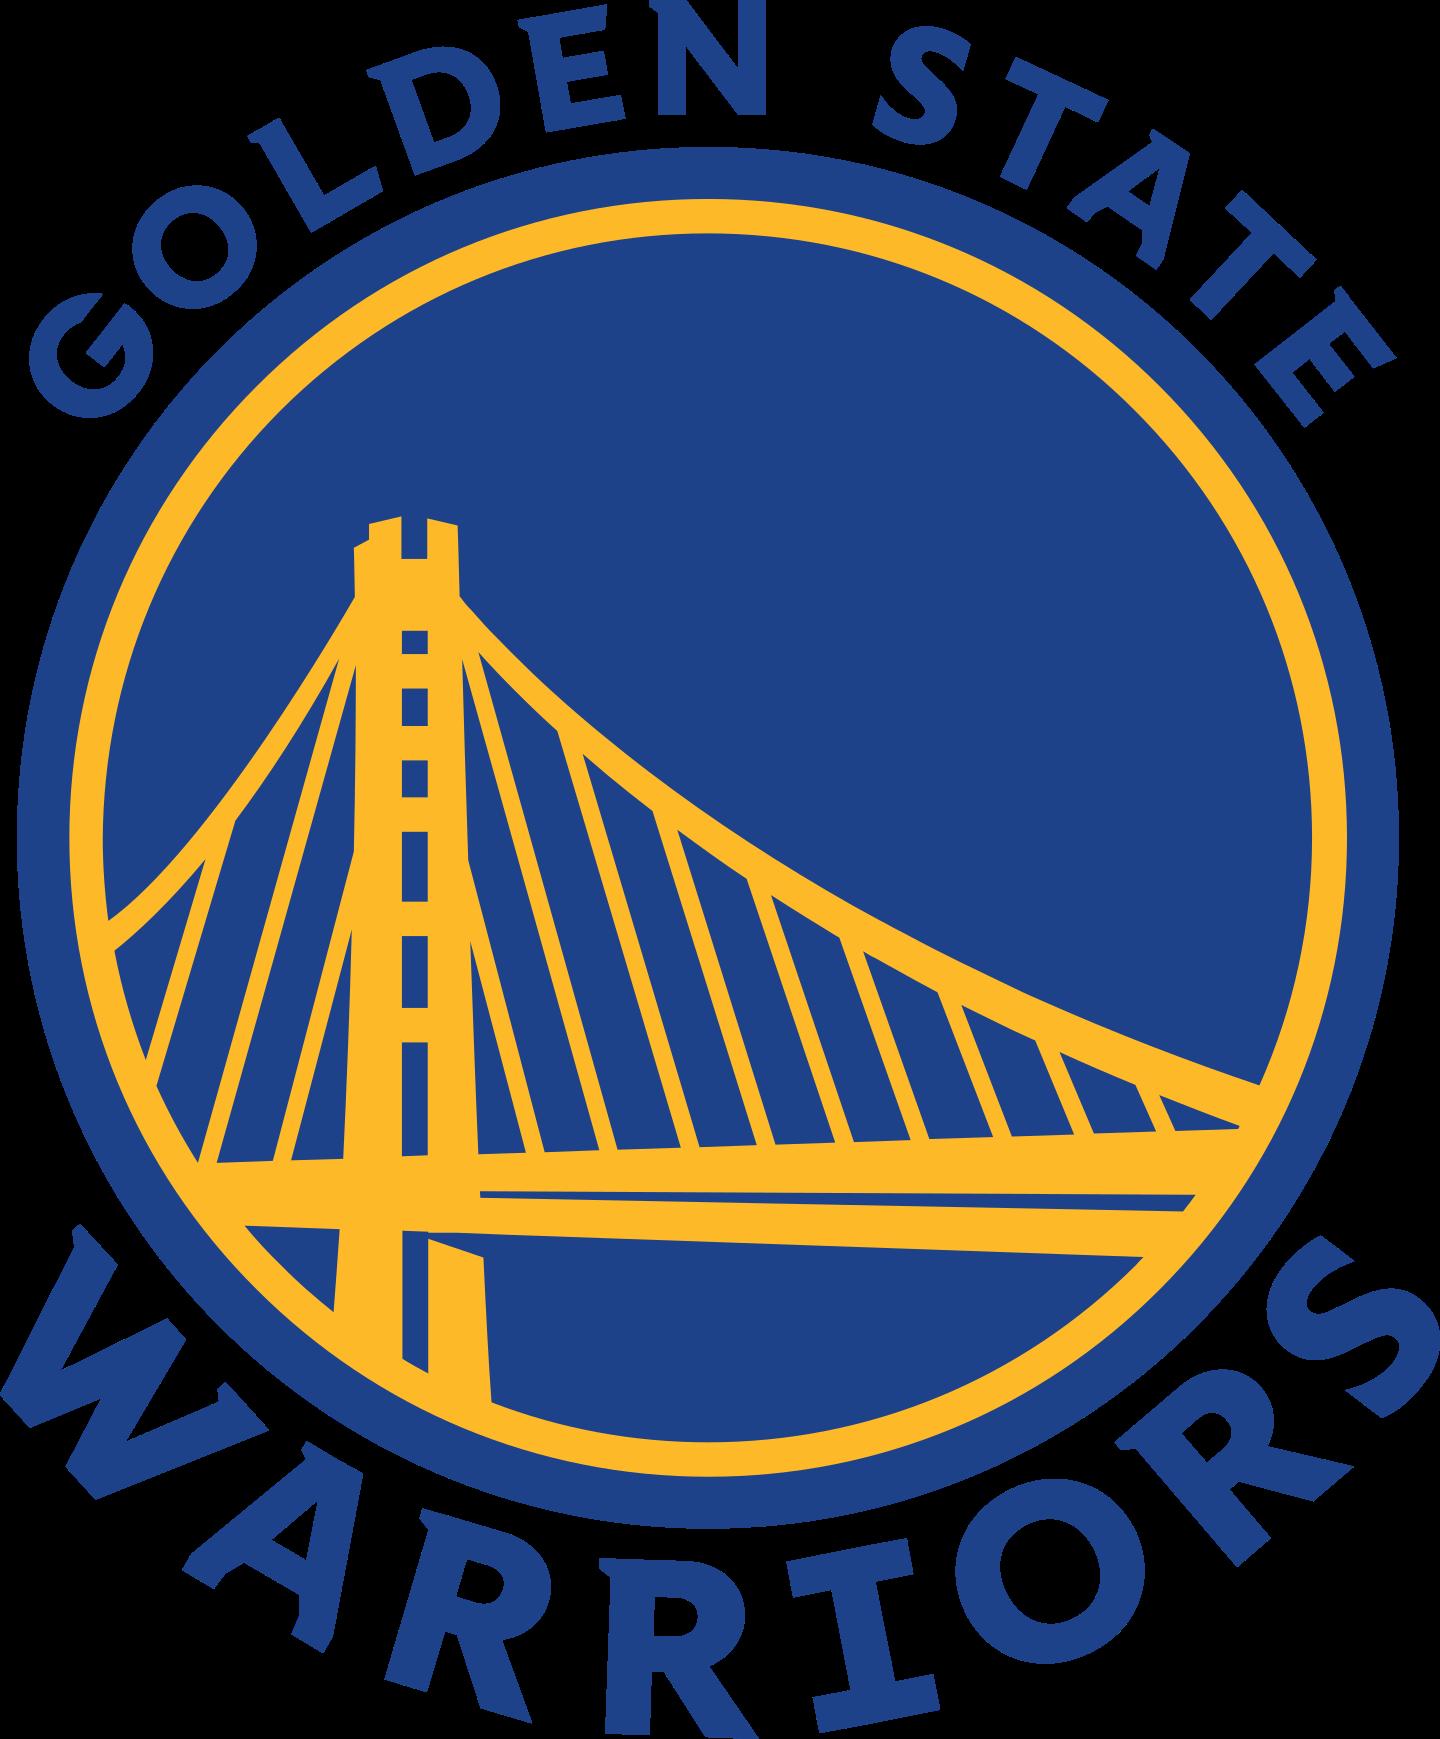 golden state warriors logo 3 1 - Golden State Warriors Logo